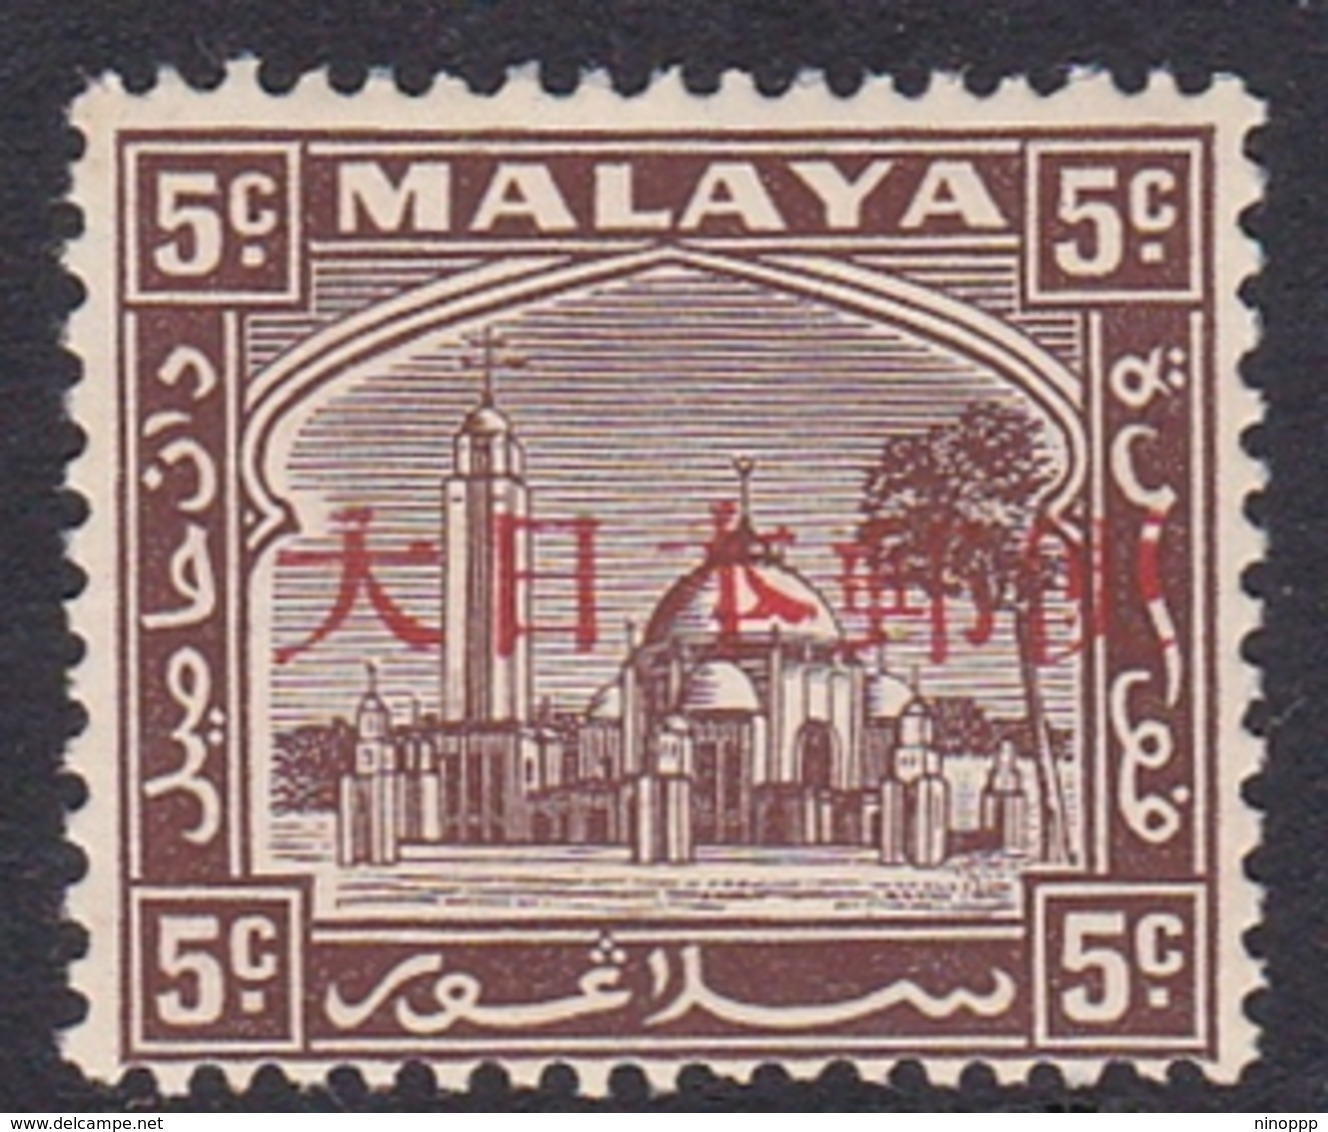 Malaya-Selangor Japan Occupation N 32 1943 5c Chocolate, Mint Never Hinged - Gran Bretaña (antiguas Colonias Y Protectorados)